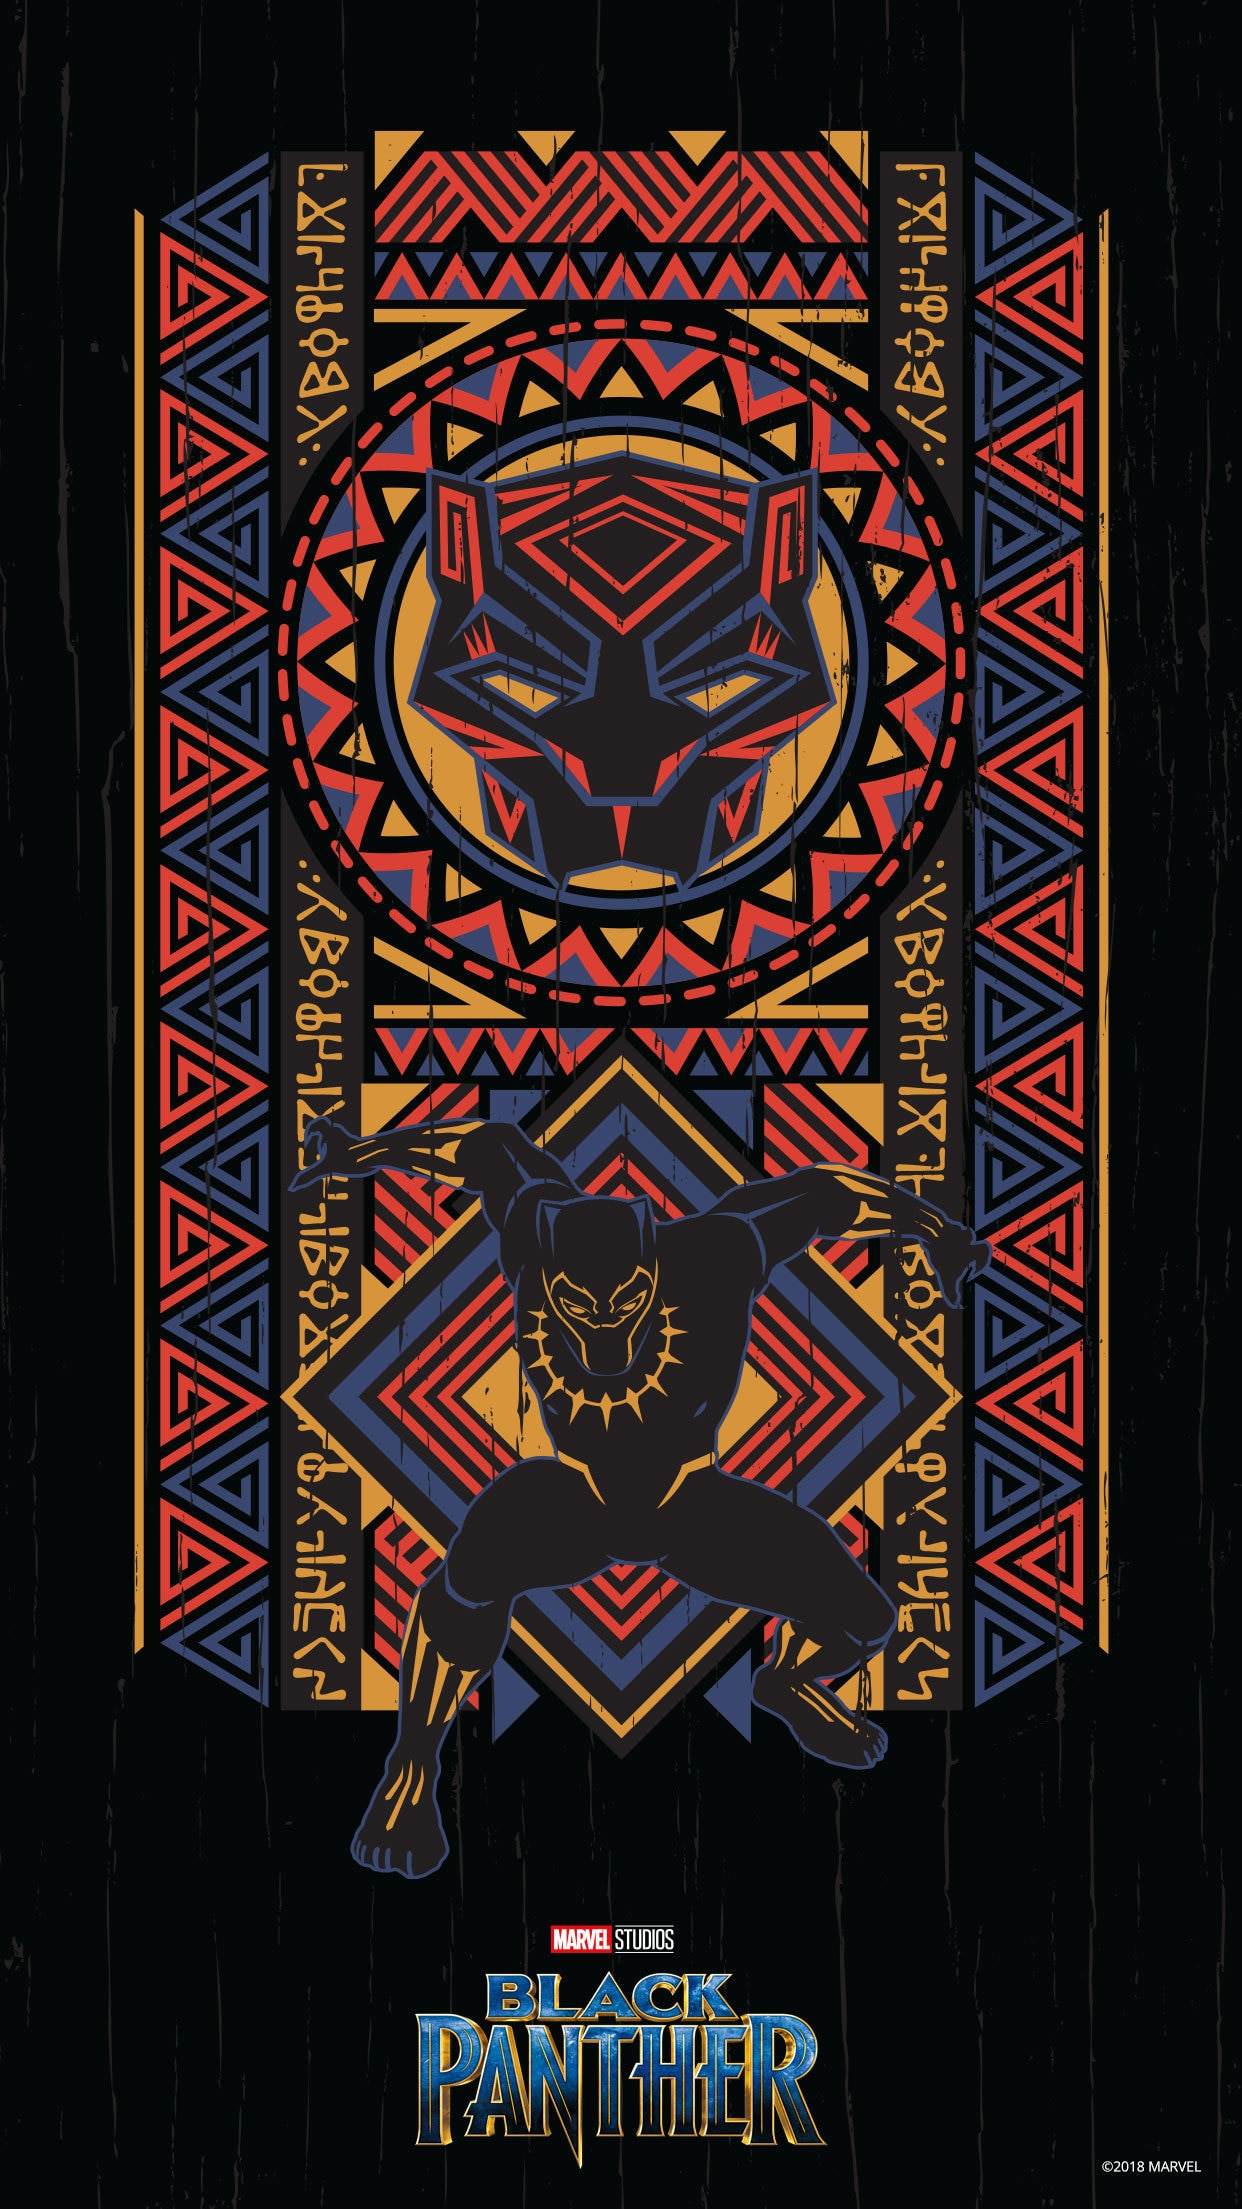 Black Panther Mobile Wallpapers Disney Movies Singapore